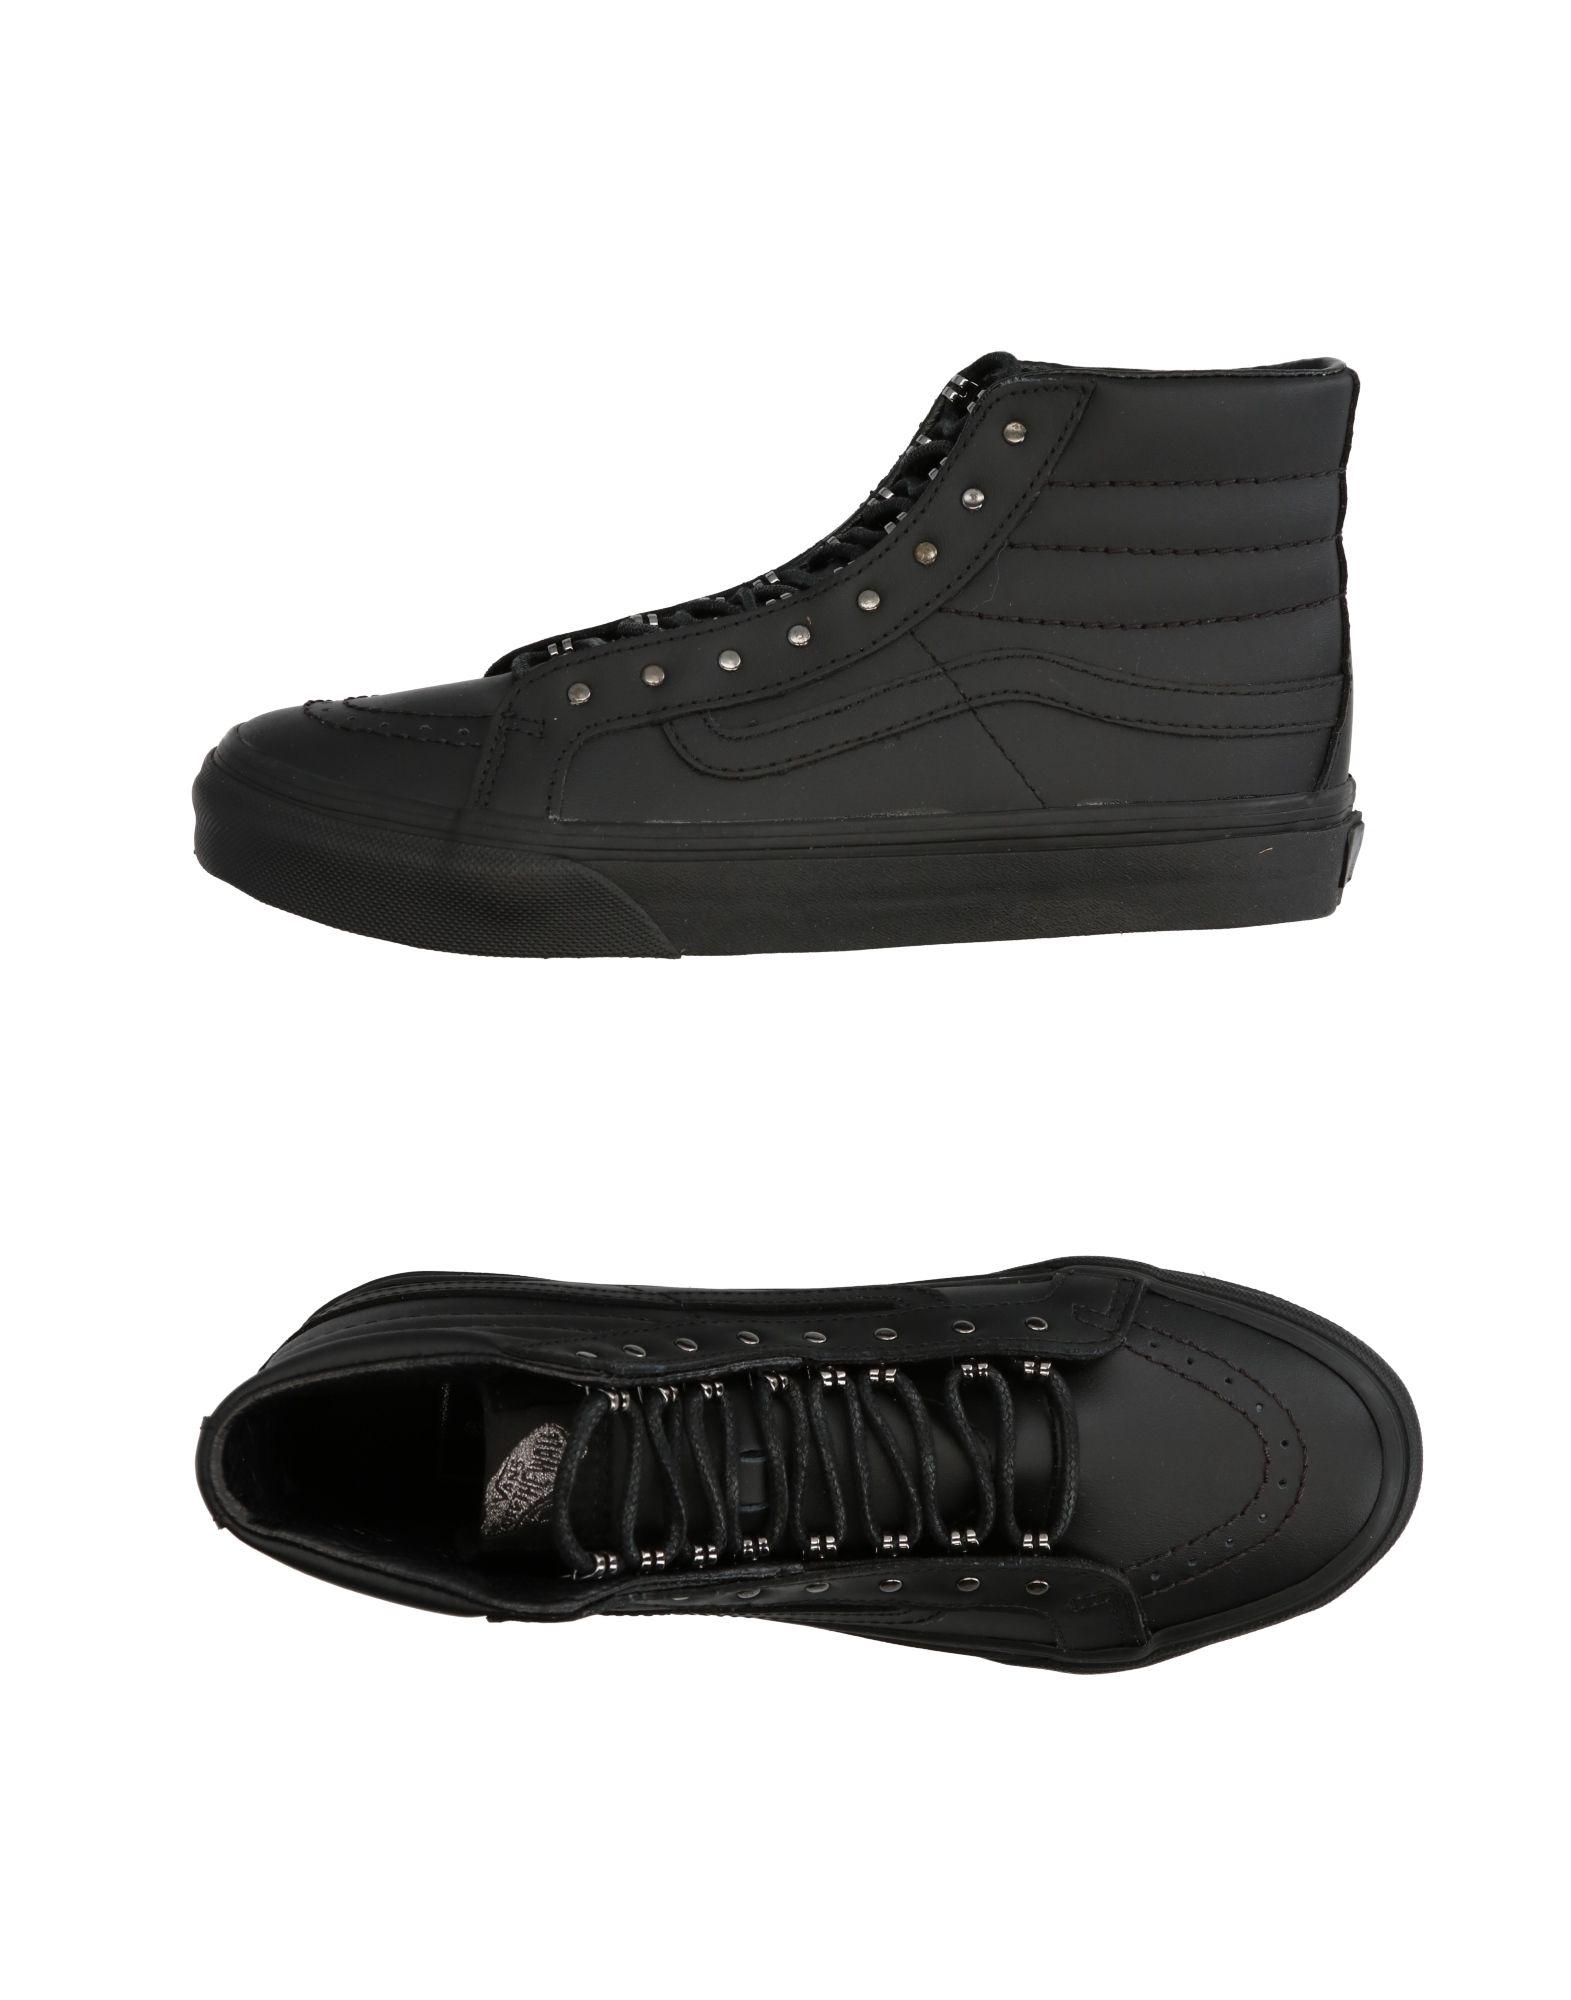 Vans Sneakers Damen Gutes Preis-Leistungs-Verhältnis, Preis-Leistungs-Verhältnis, Preis-Leistungs-Verhältnis, es lohnt sich 11a2c1